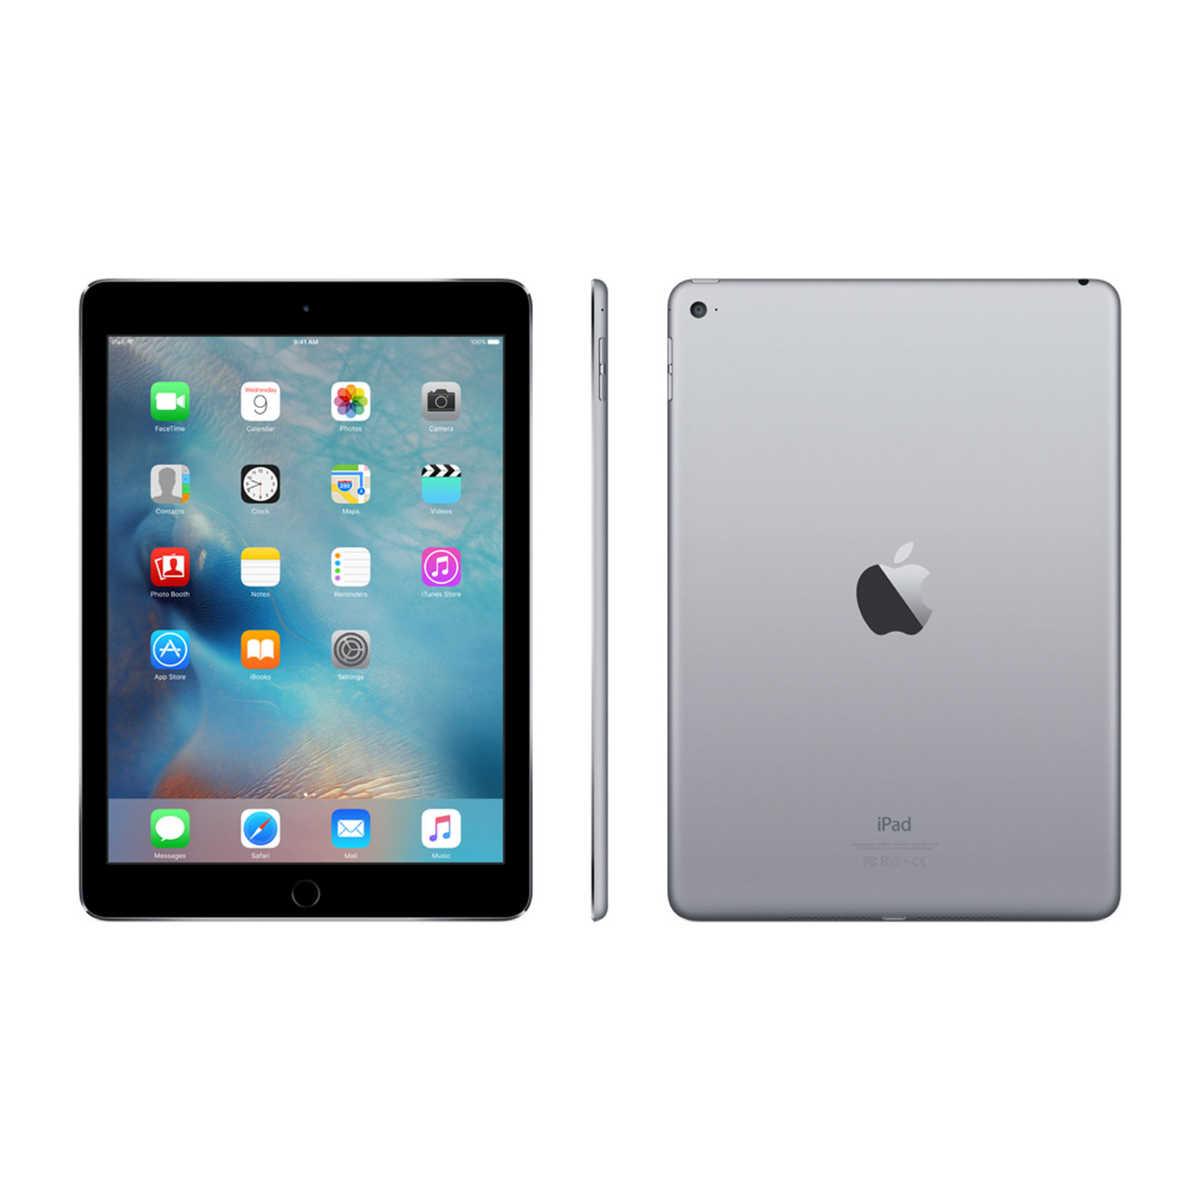 iPad Air 2 Space Grey 64GB WiFi Grade A MGKL2X/A